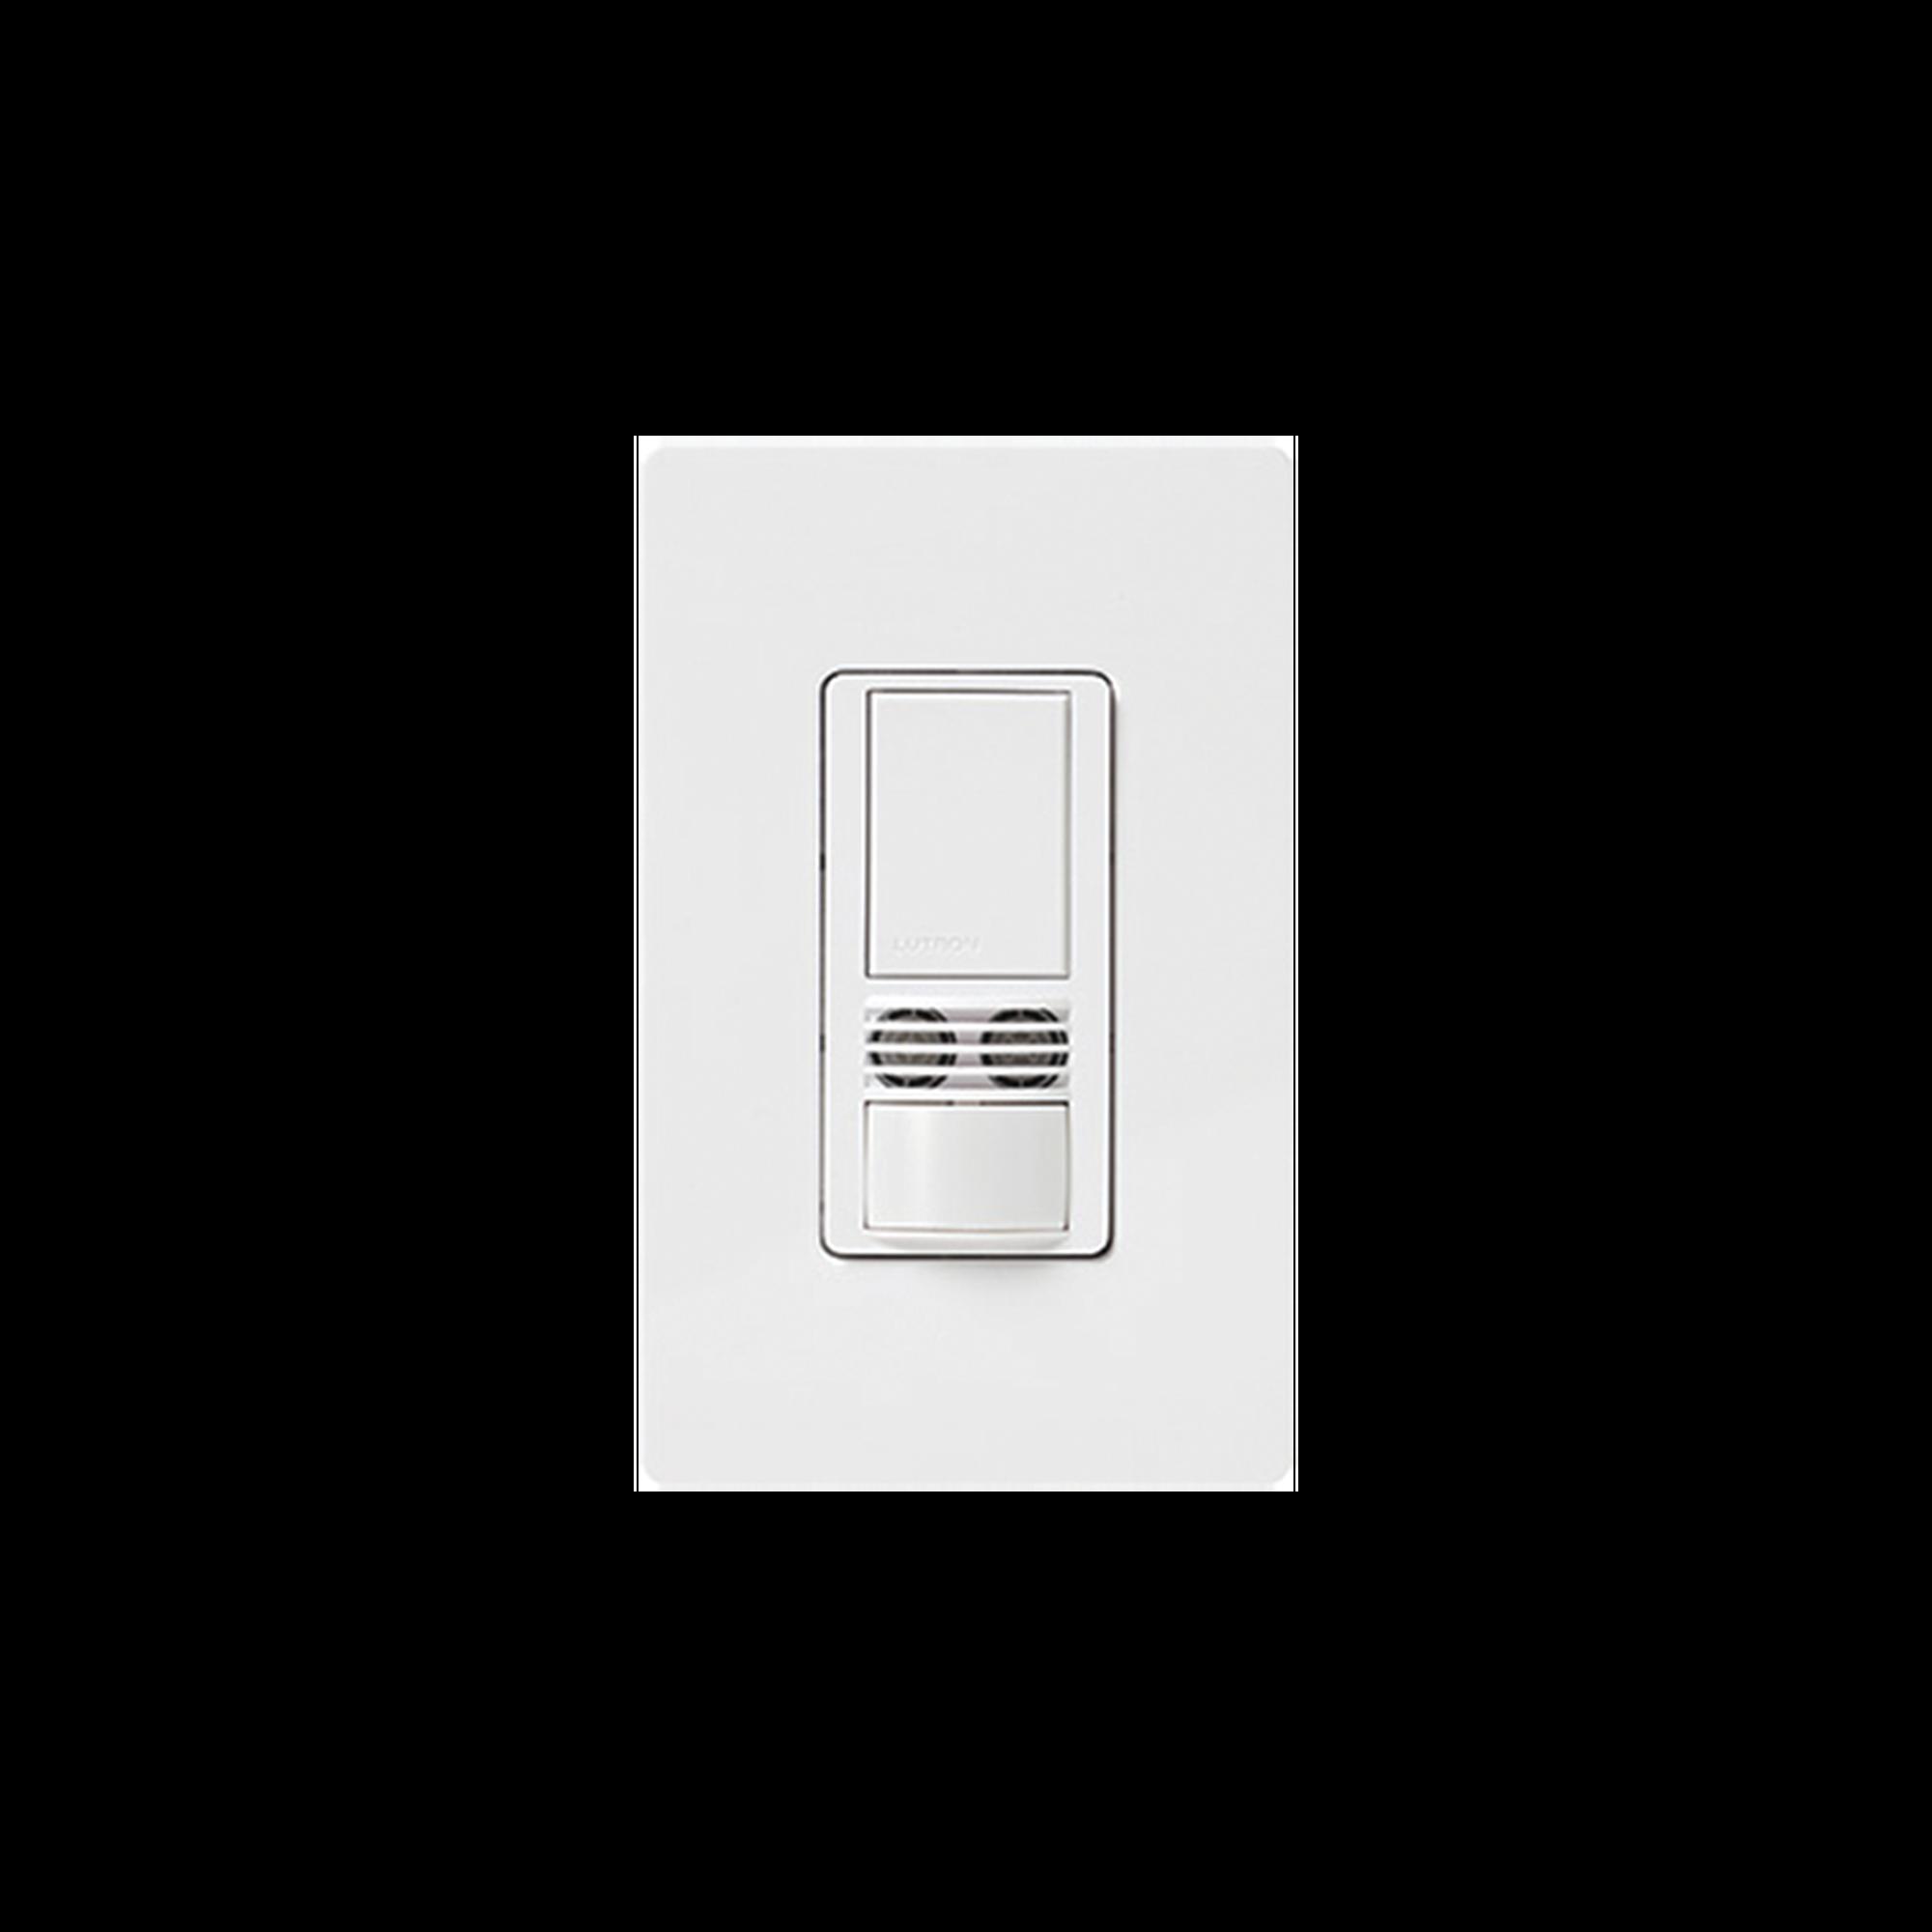 MAESTRO, Sensor switch, occupancy, multilocacion / un solo polo requiere neutro 120-227, 6A, color blanco